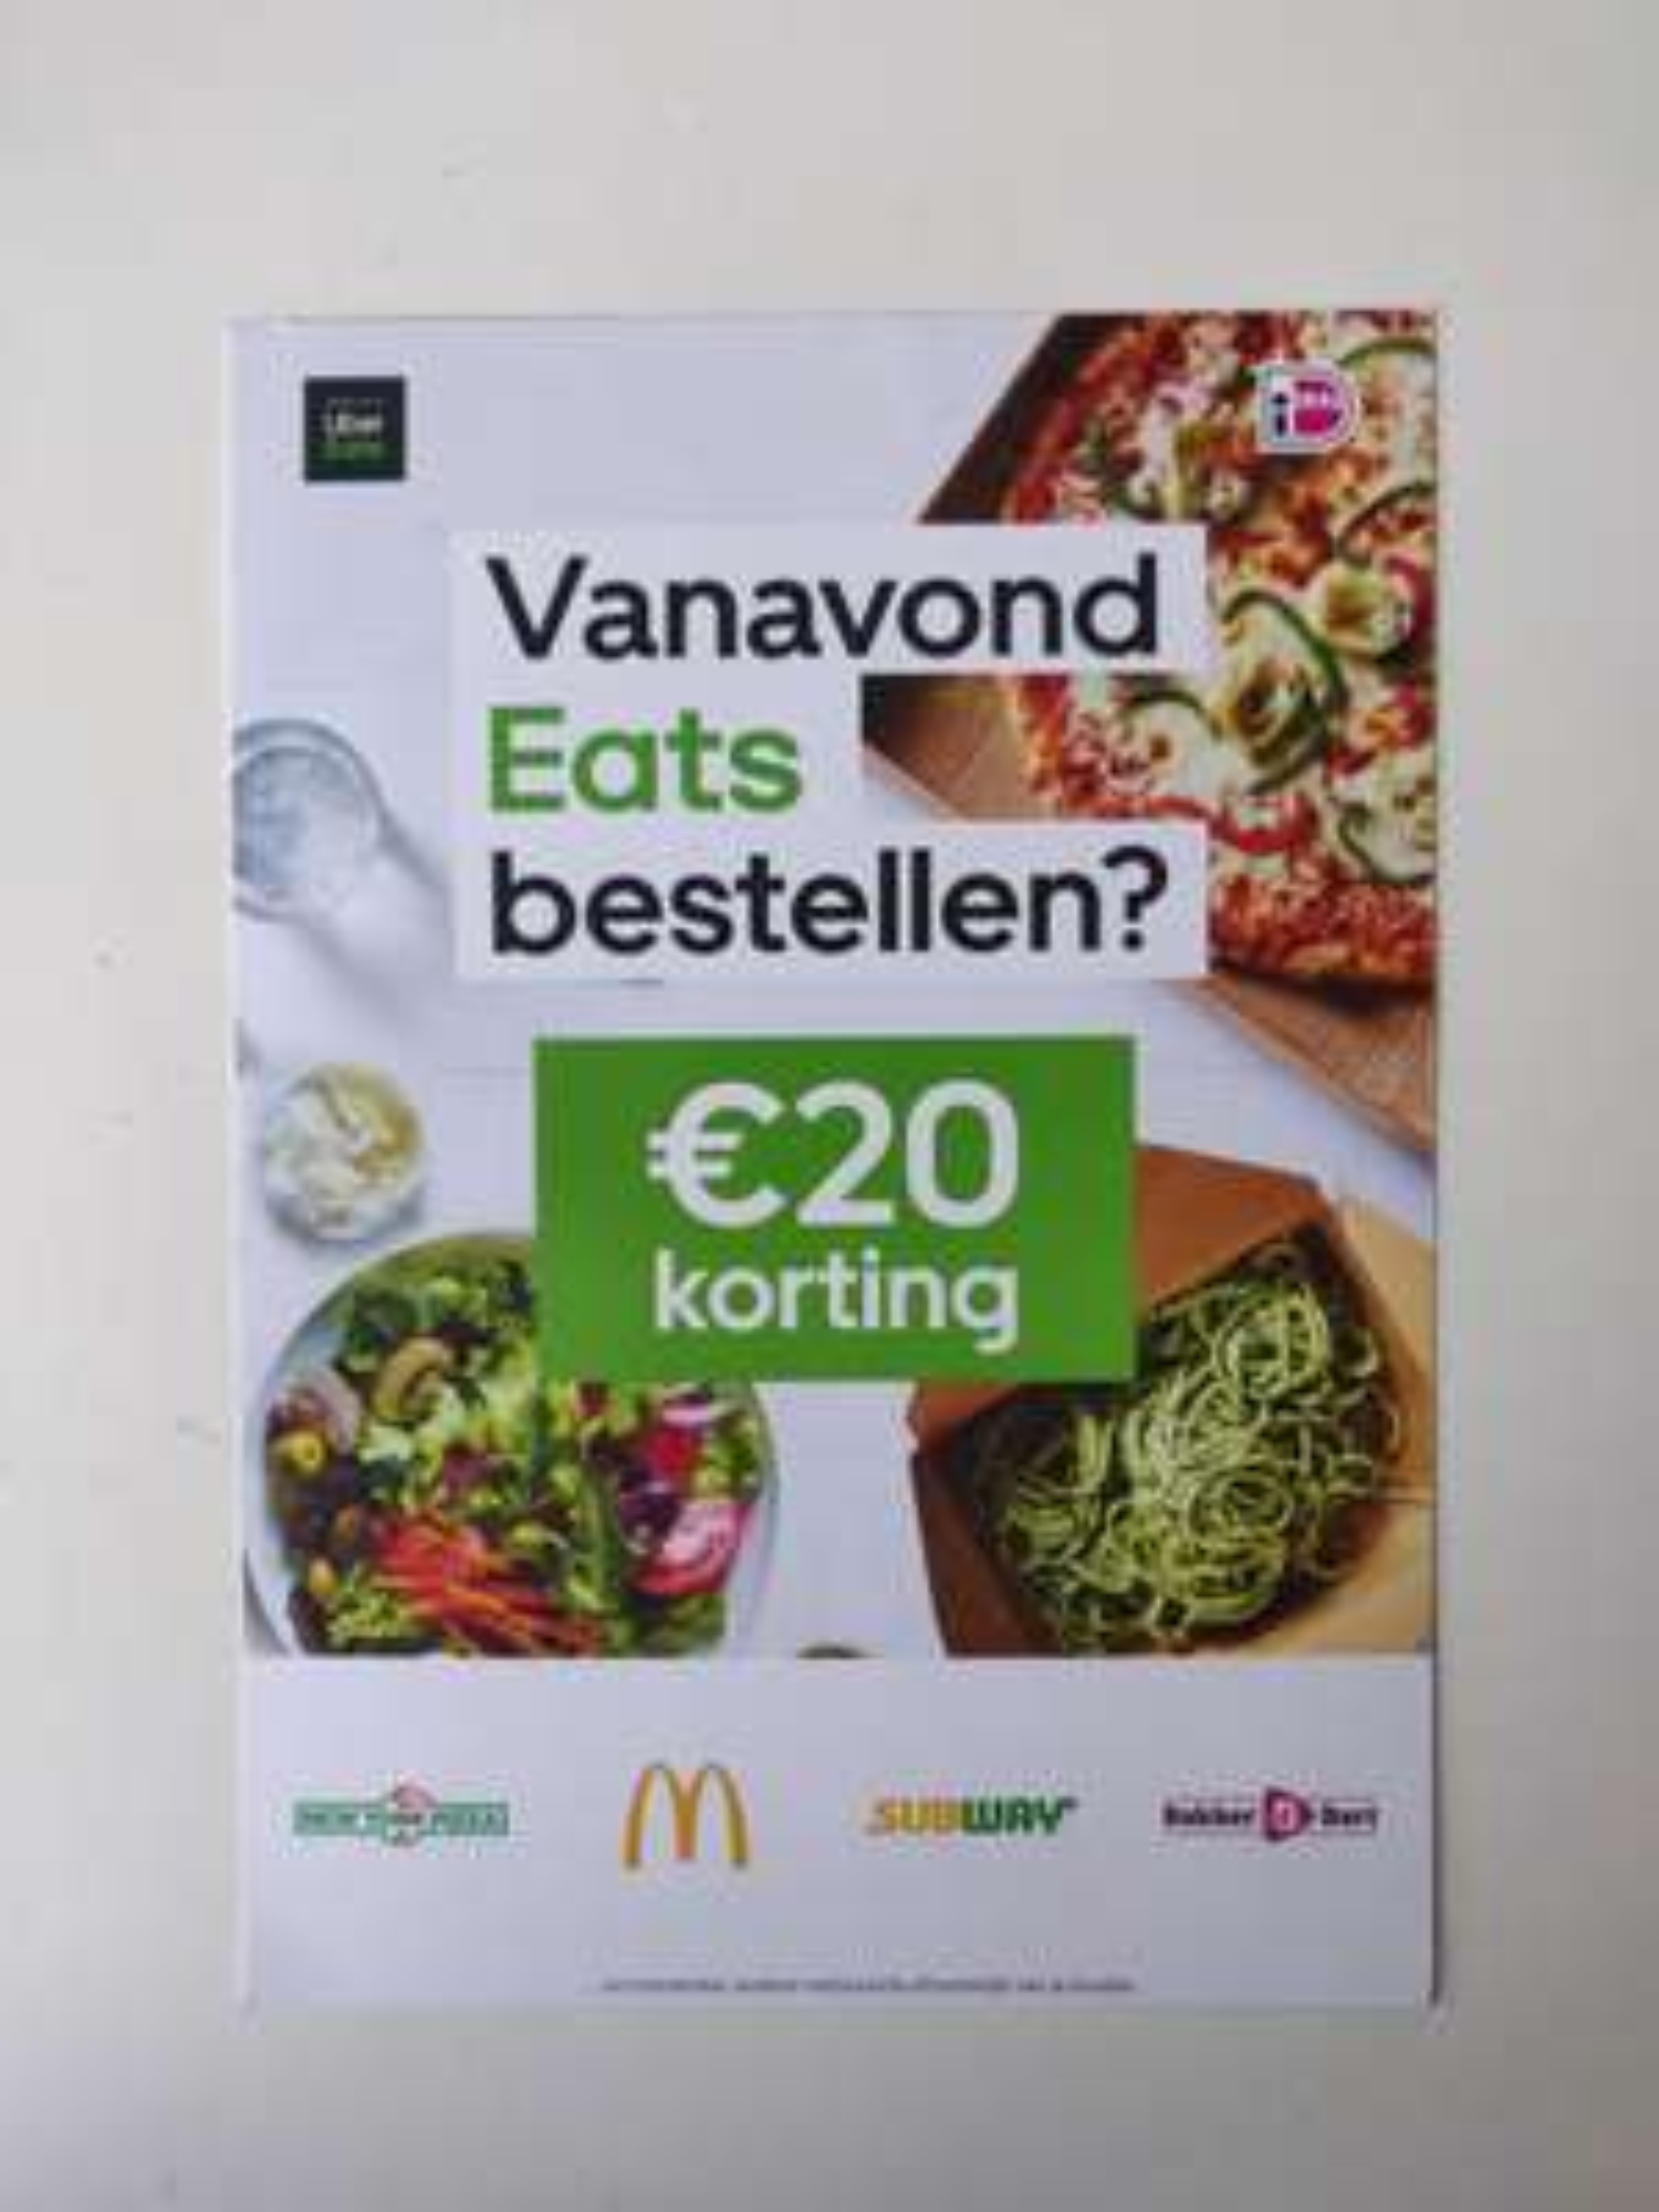 2x €10 korting voor nieuwe gebruikers van Uber Eats (Omgeving Arnhem)